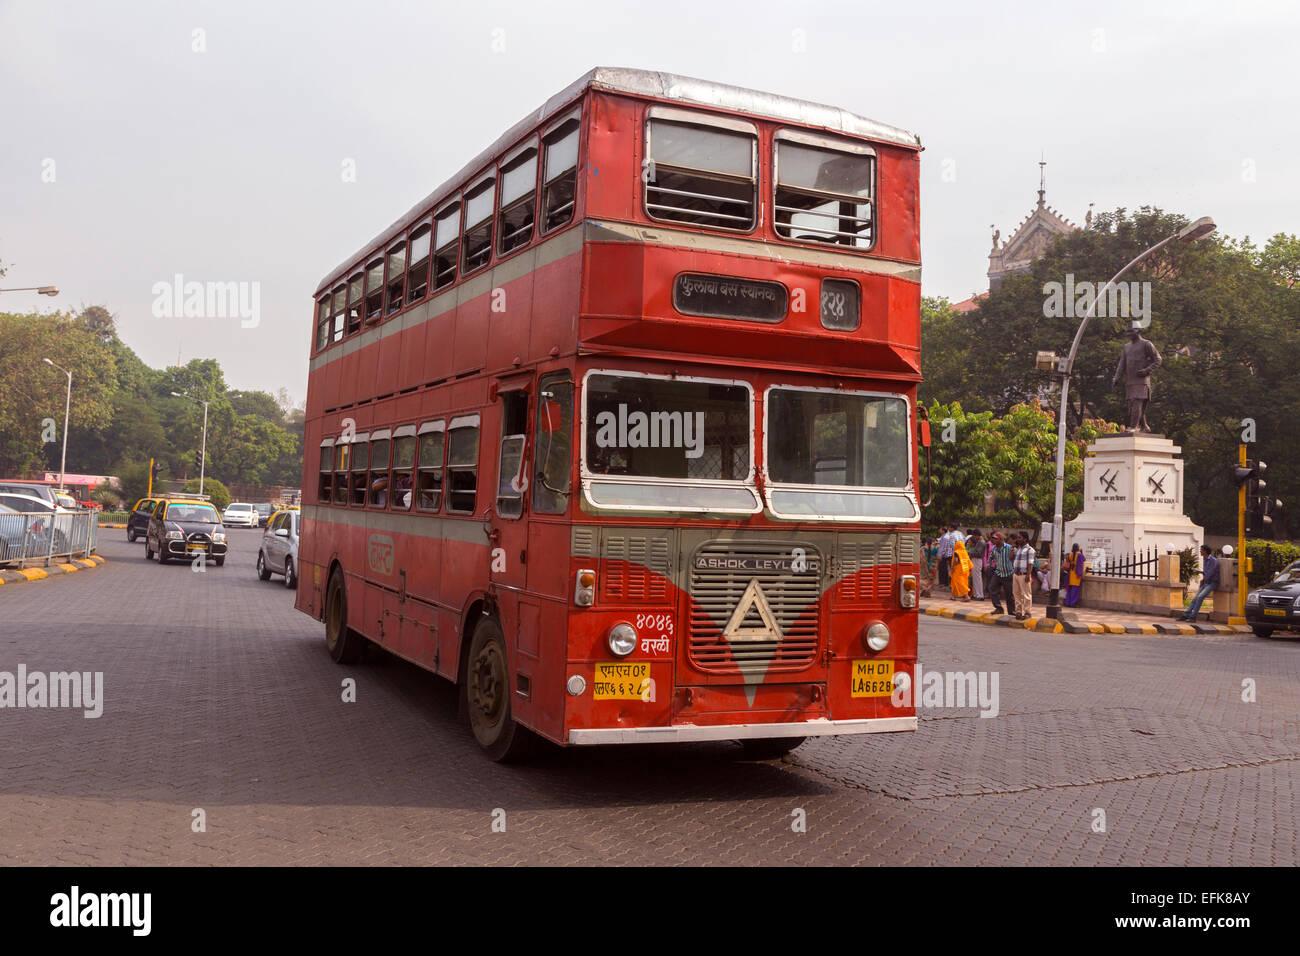 India, Maharashtra, Mumbai, Colaba, red double decker bus - Stock Image